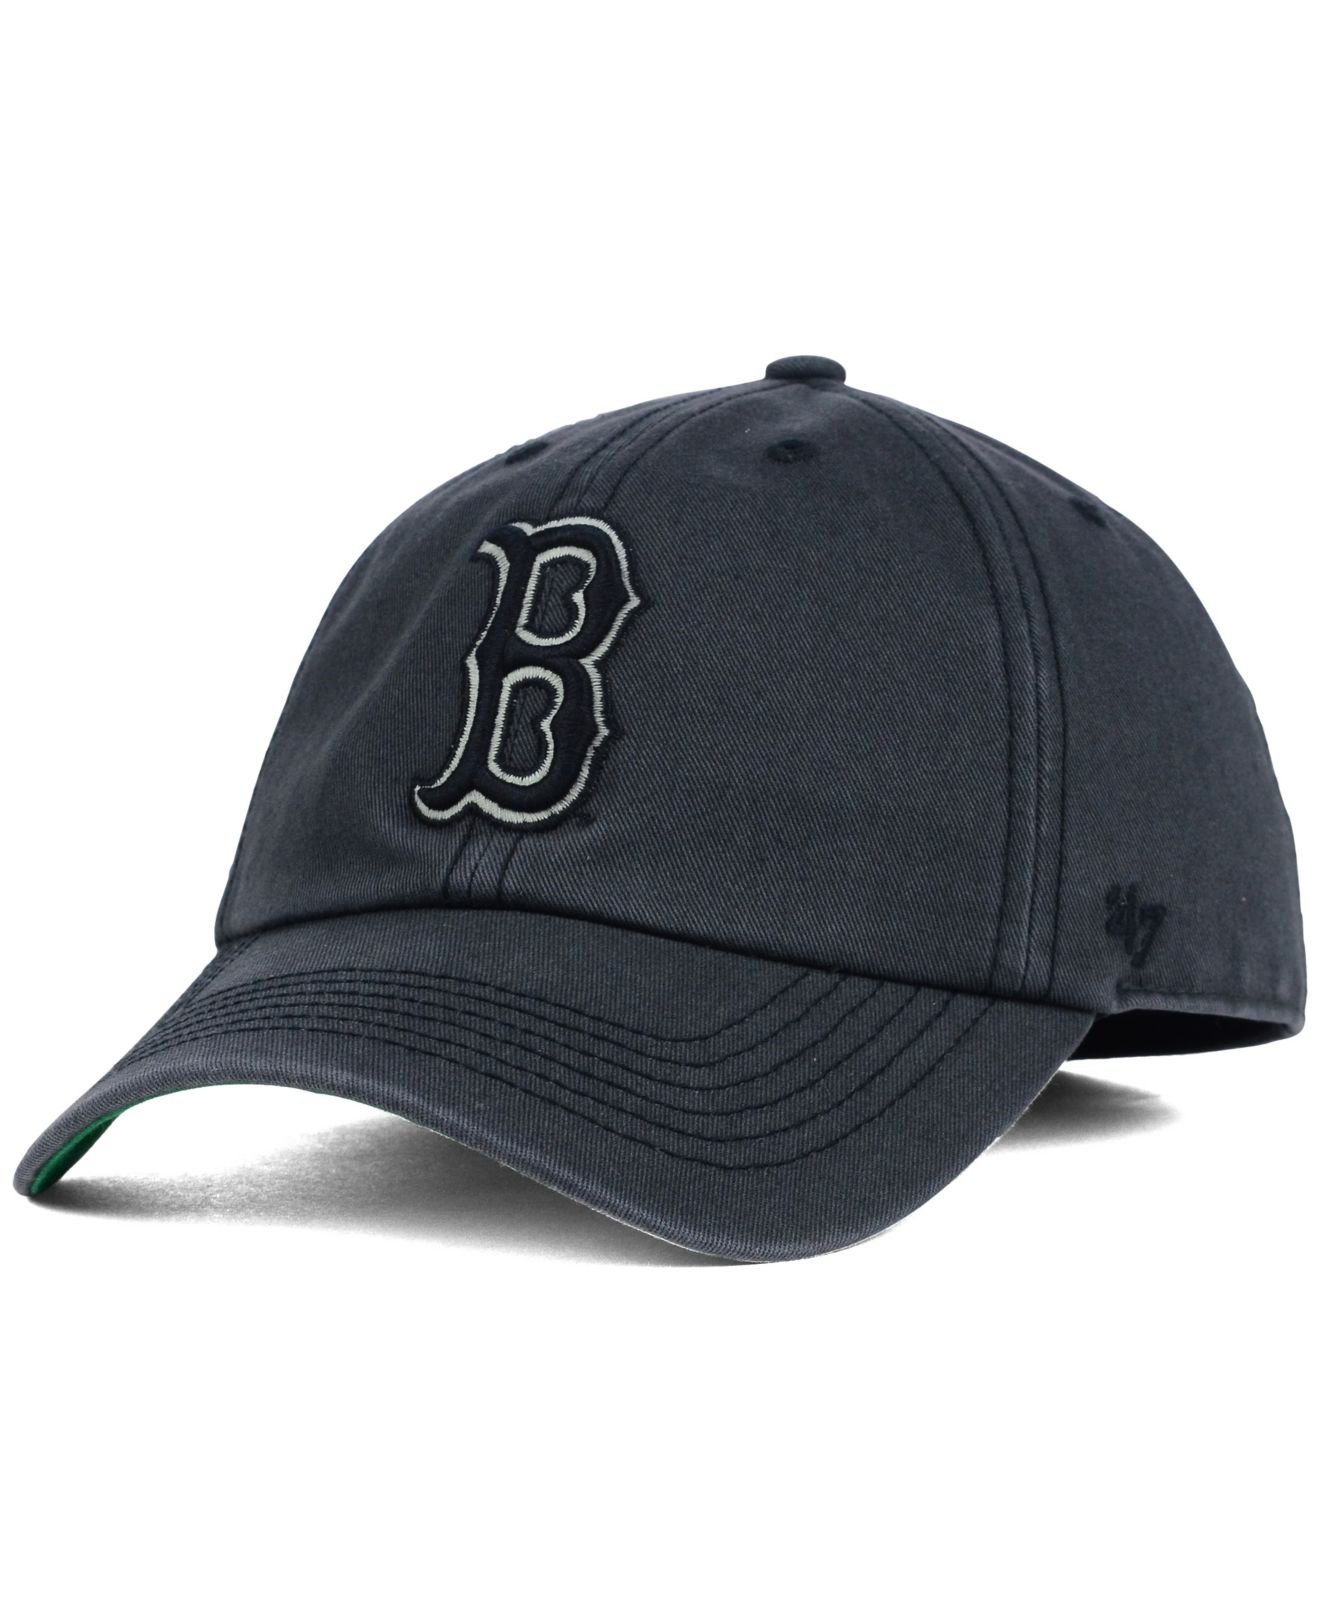 best cheap e1073 ef67d ... official lyst 47 brand ucla bruins sachem cap in gray for men 60ce9  0457d